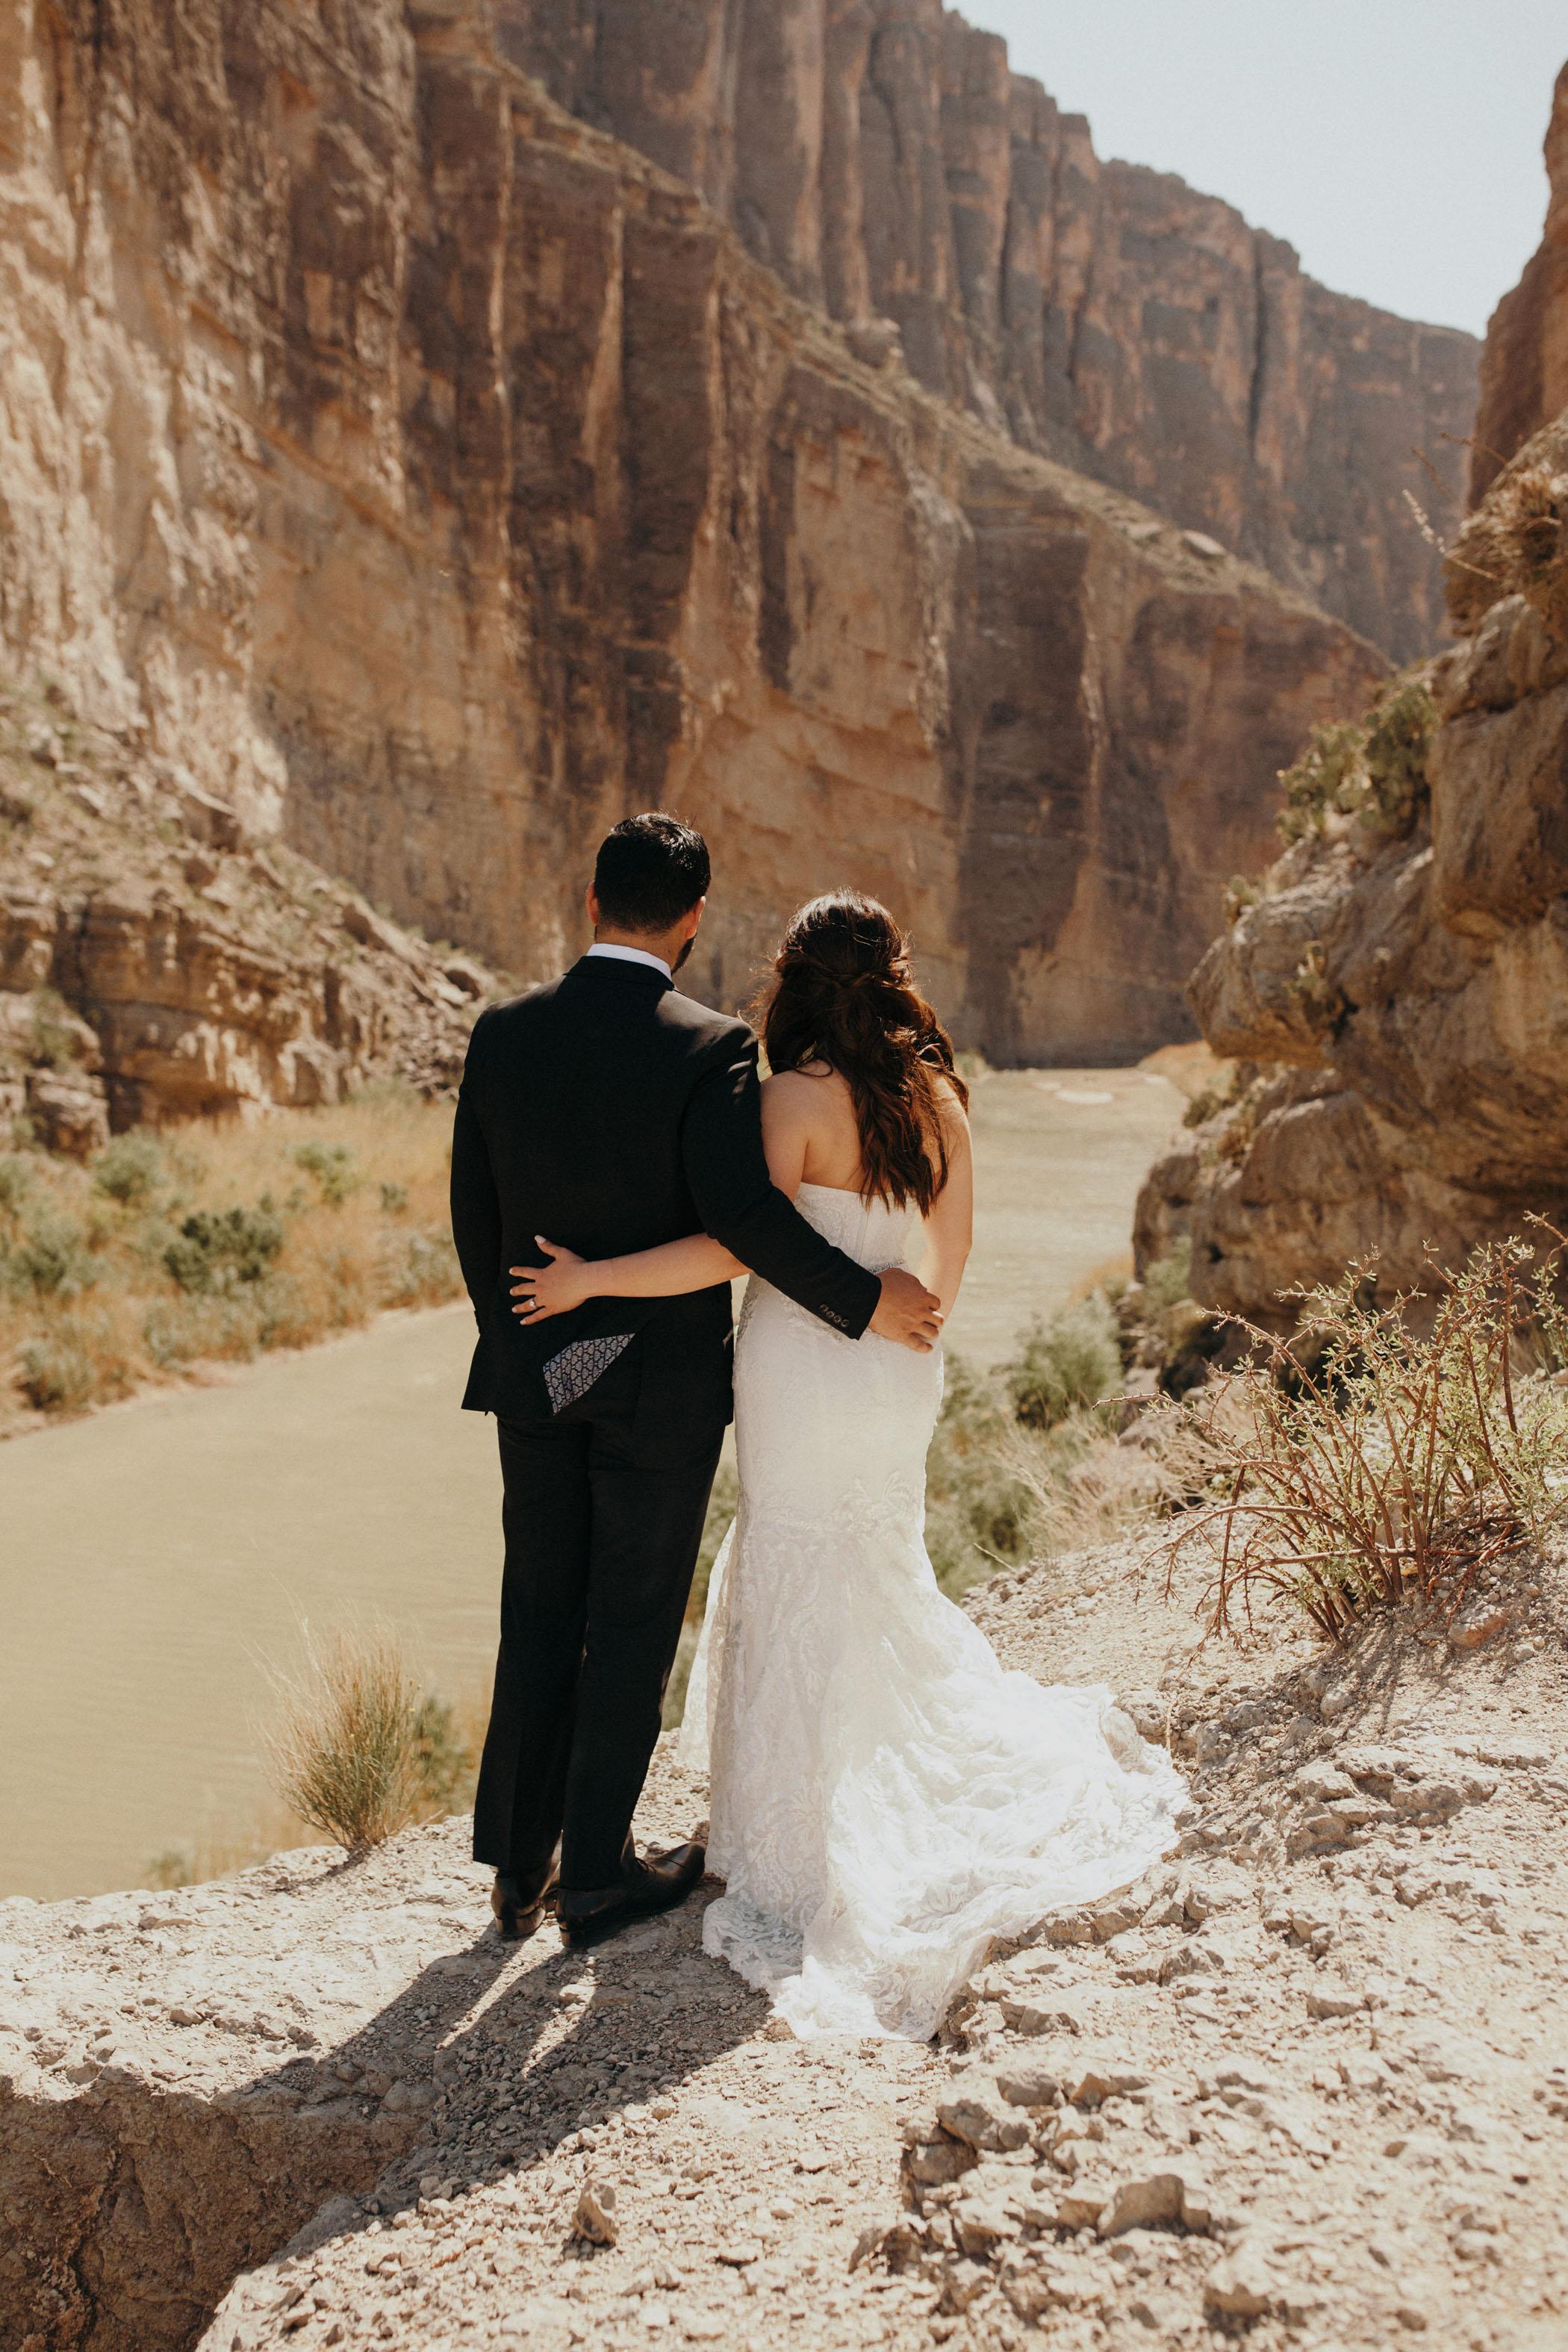 Bride and groom admiring the desert landscape